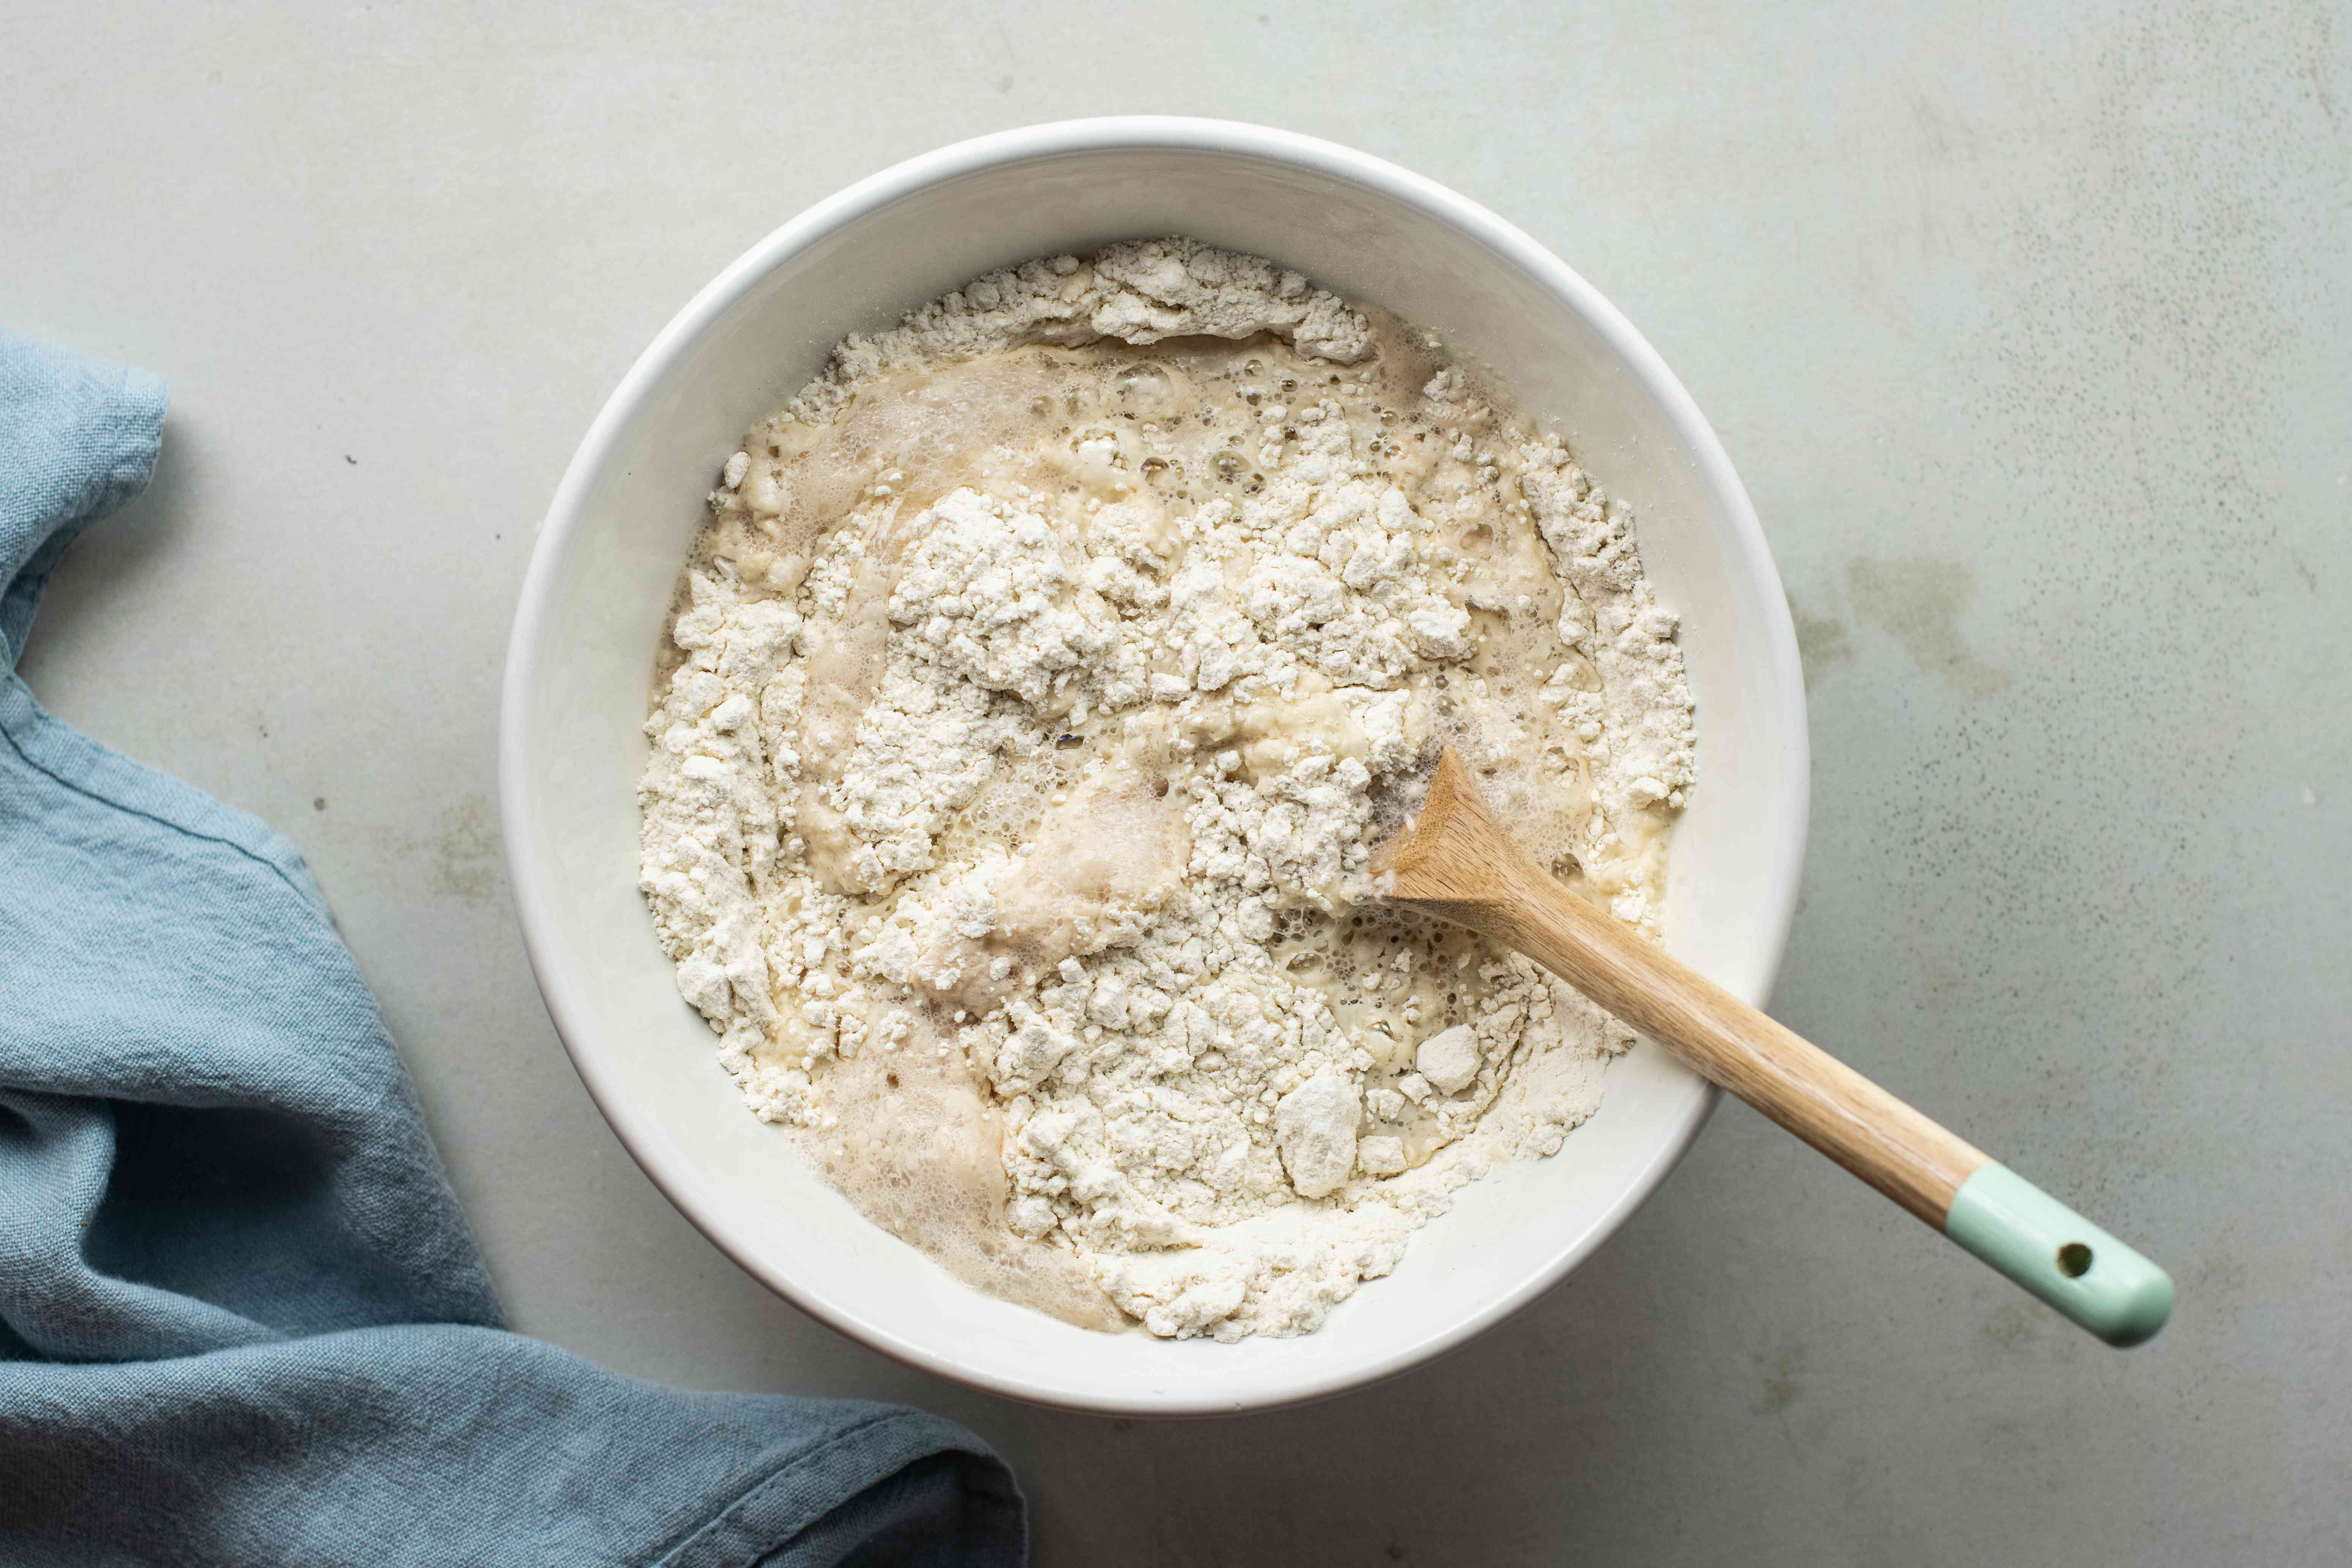 Place flour in bowl